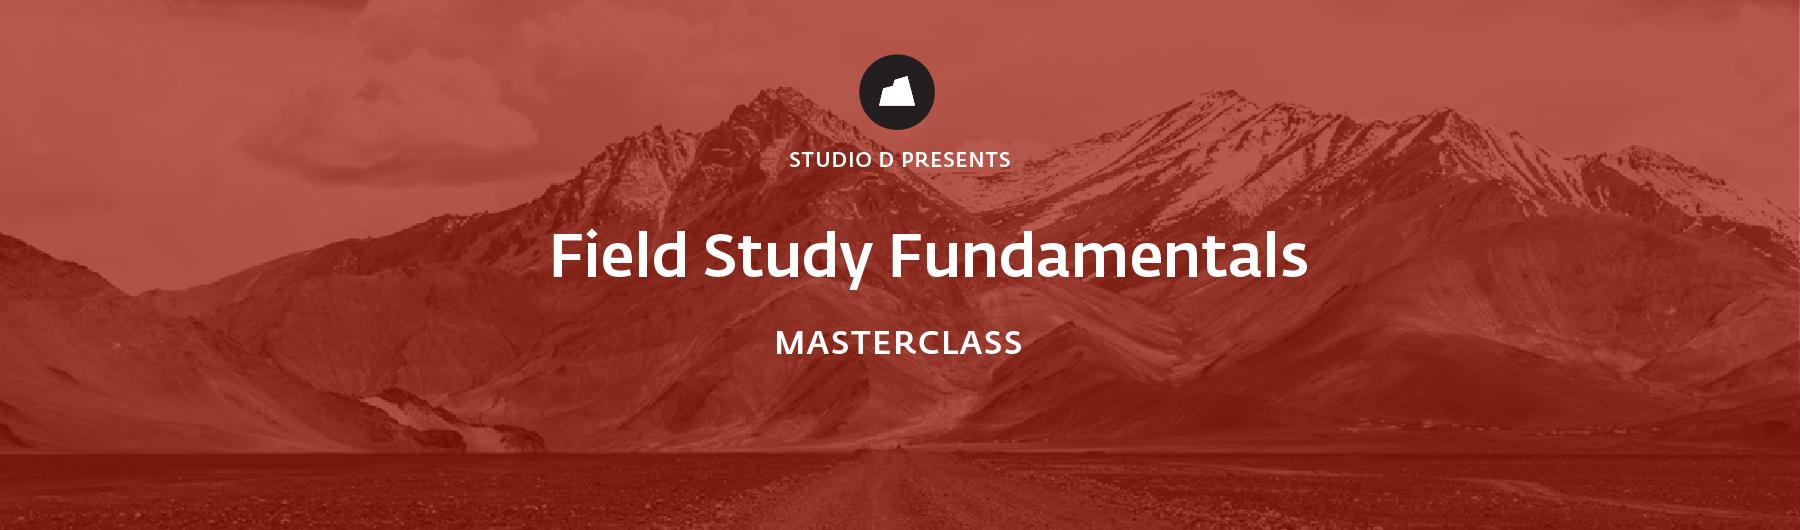 Field Study Fundamentals Masterclass, 13 April 2020, Mumbai